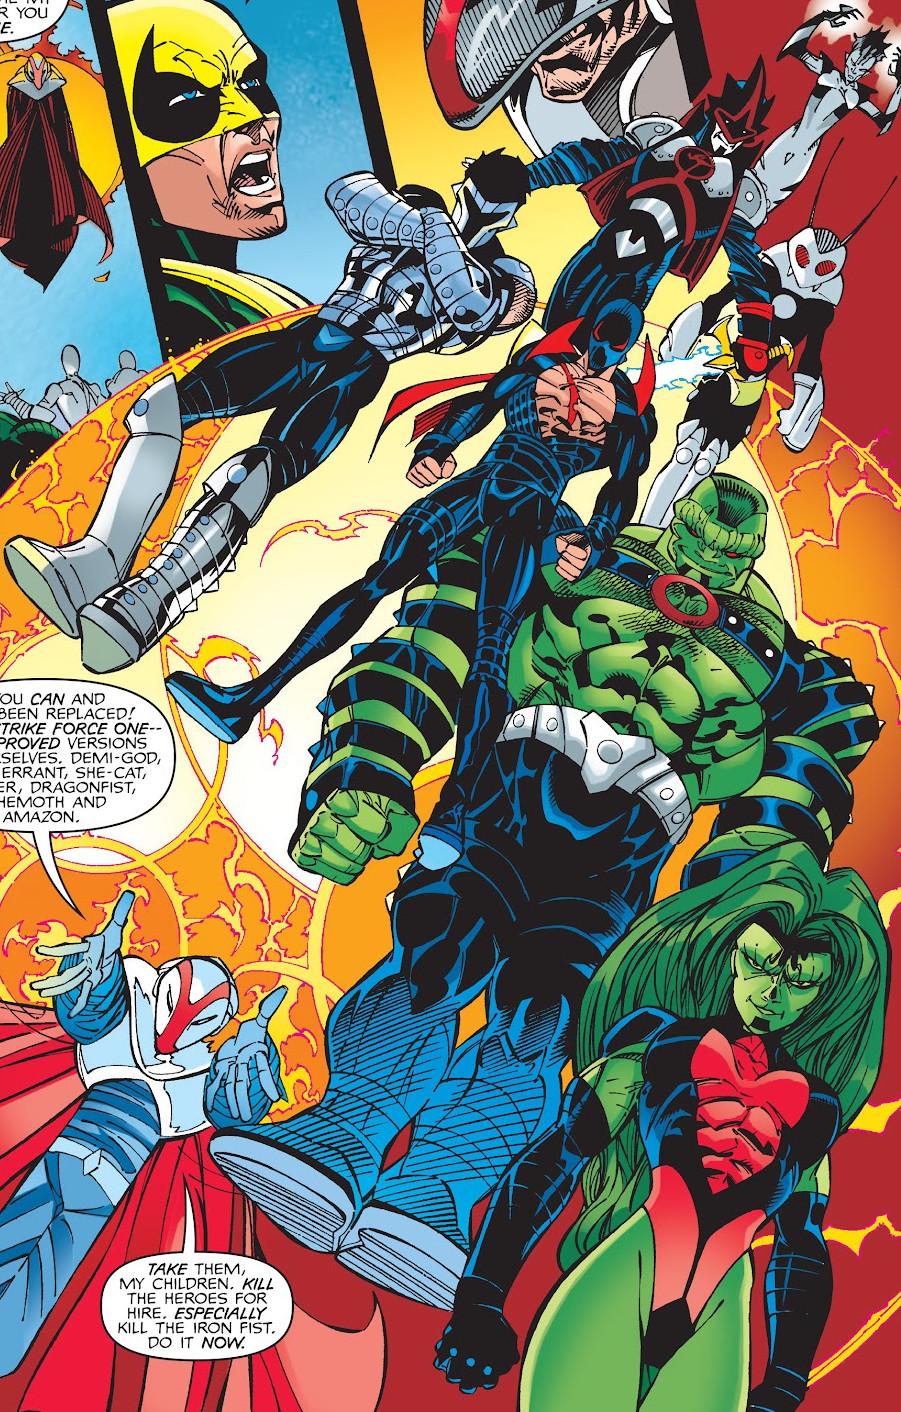 Strikeforce One (Earth-616)